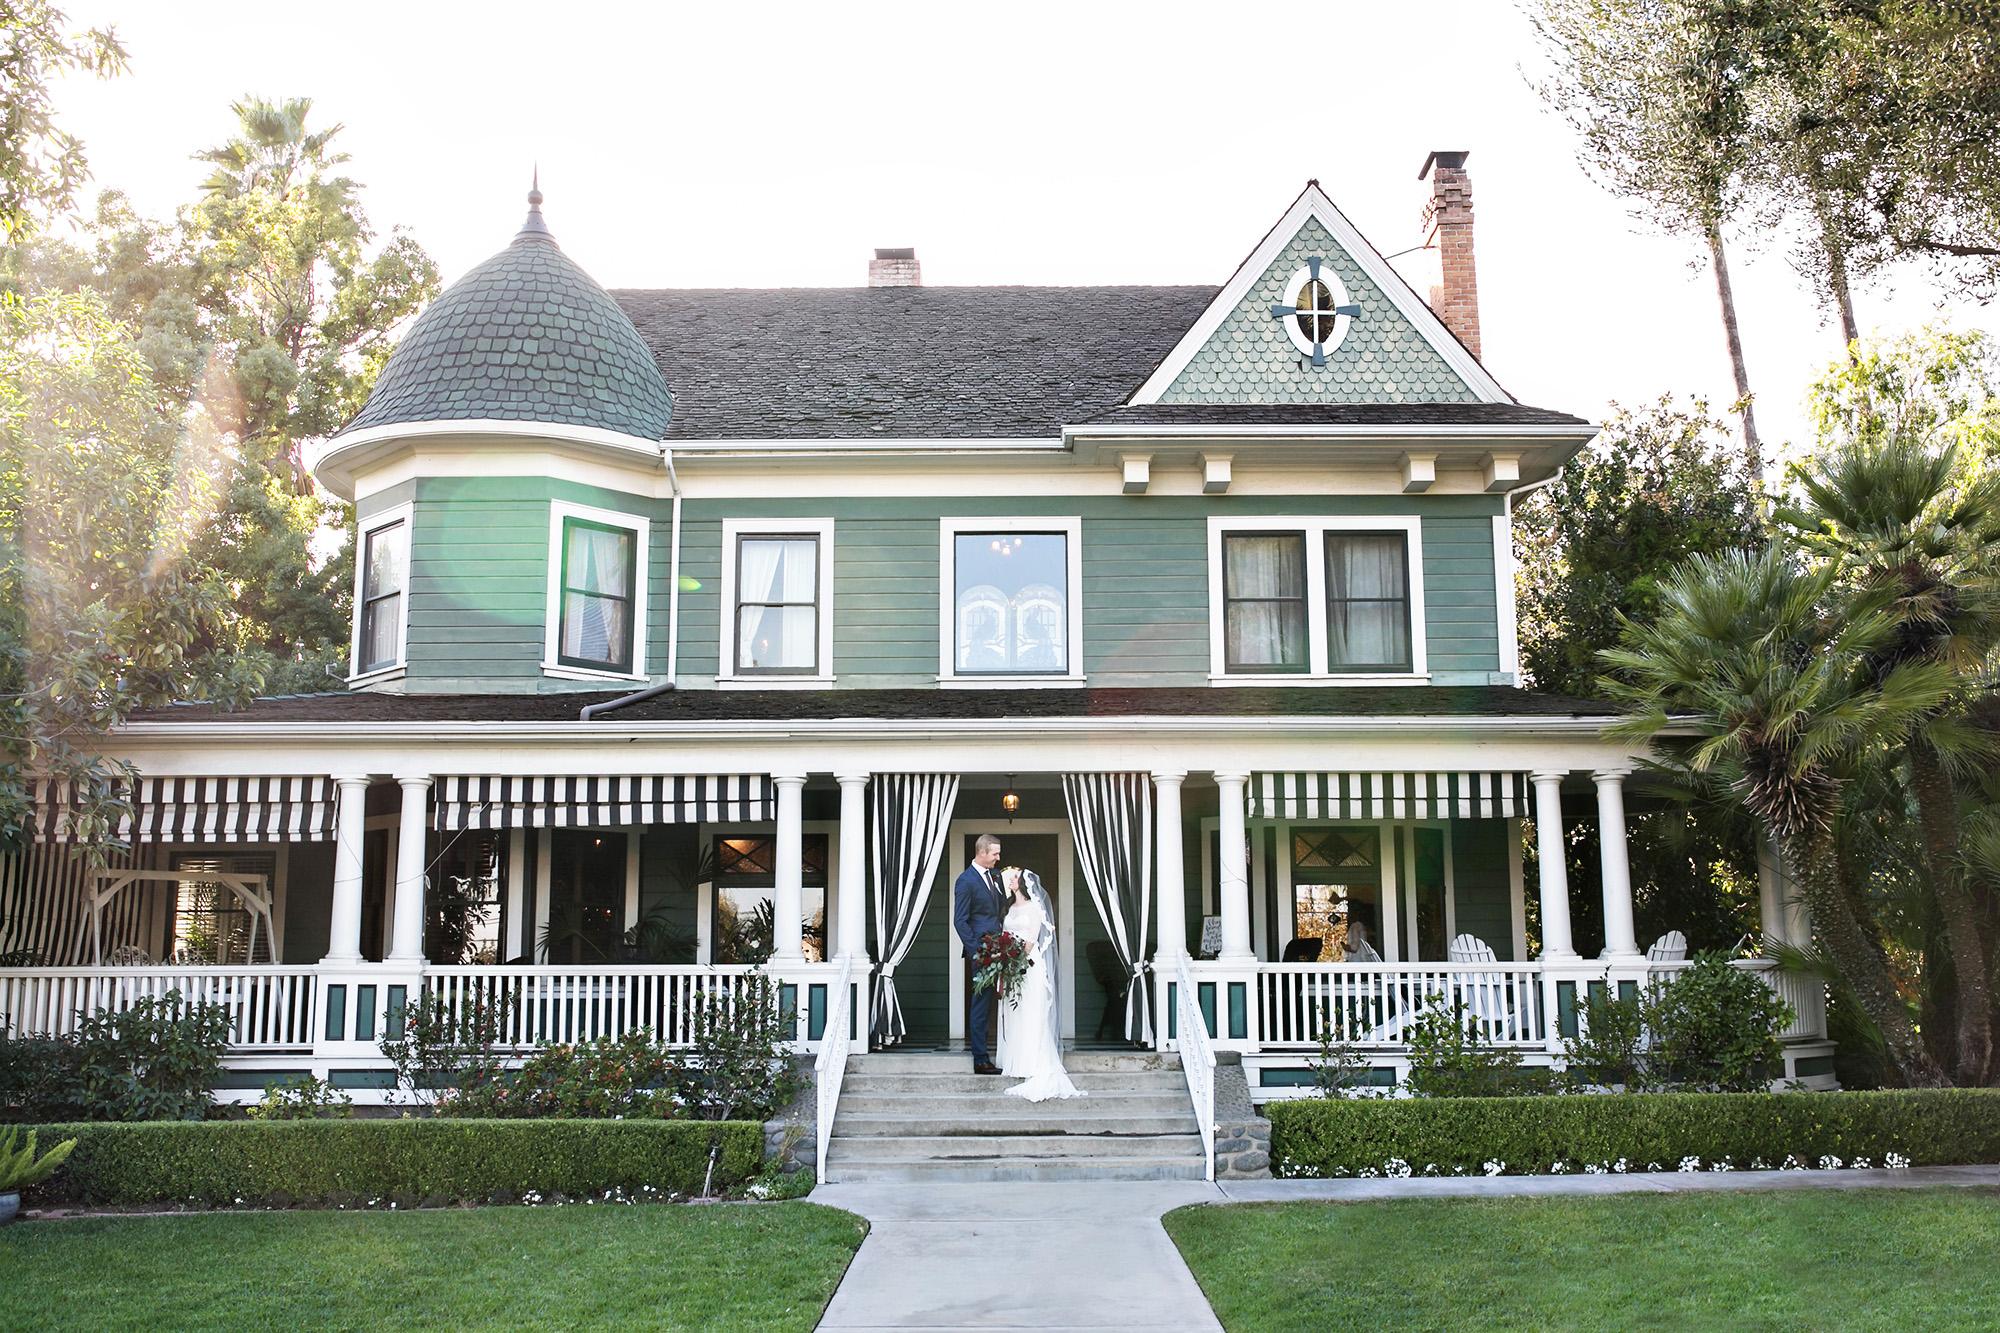 christmas-house-weddings-receptions-carrie-vines-126.jpg